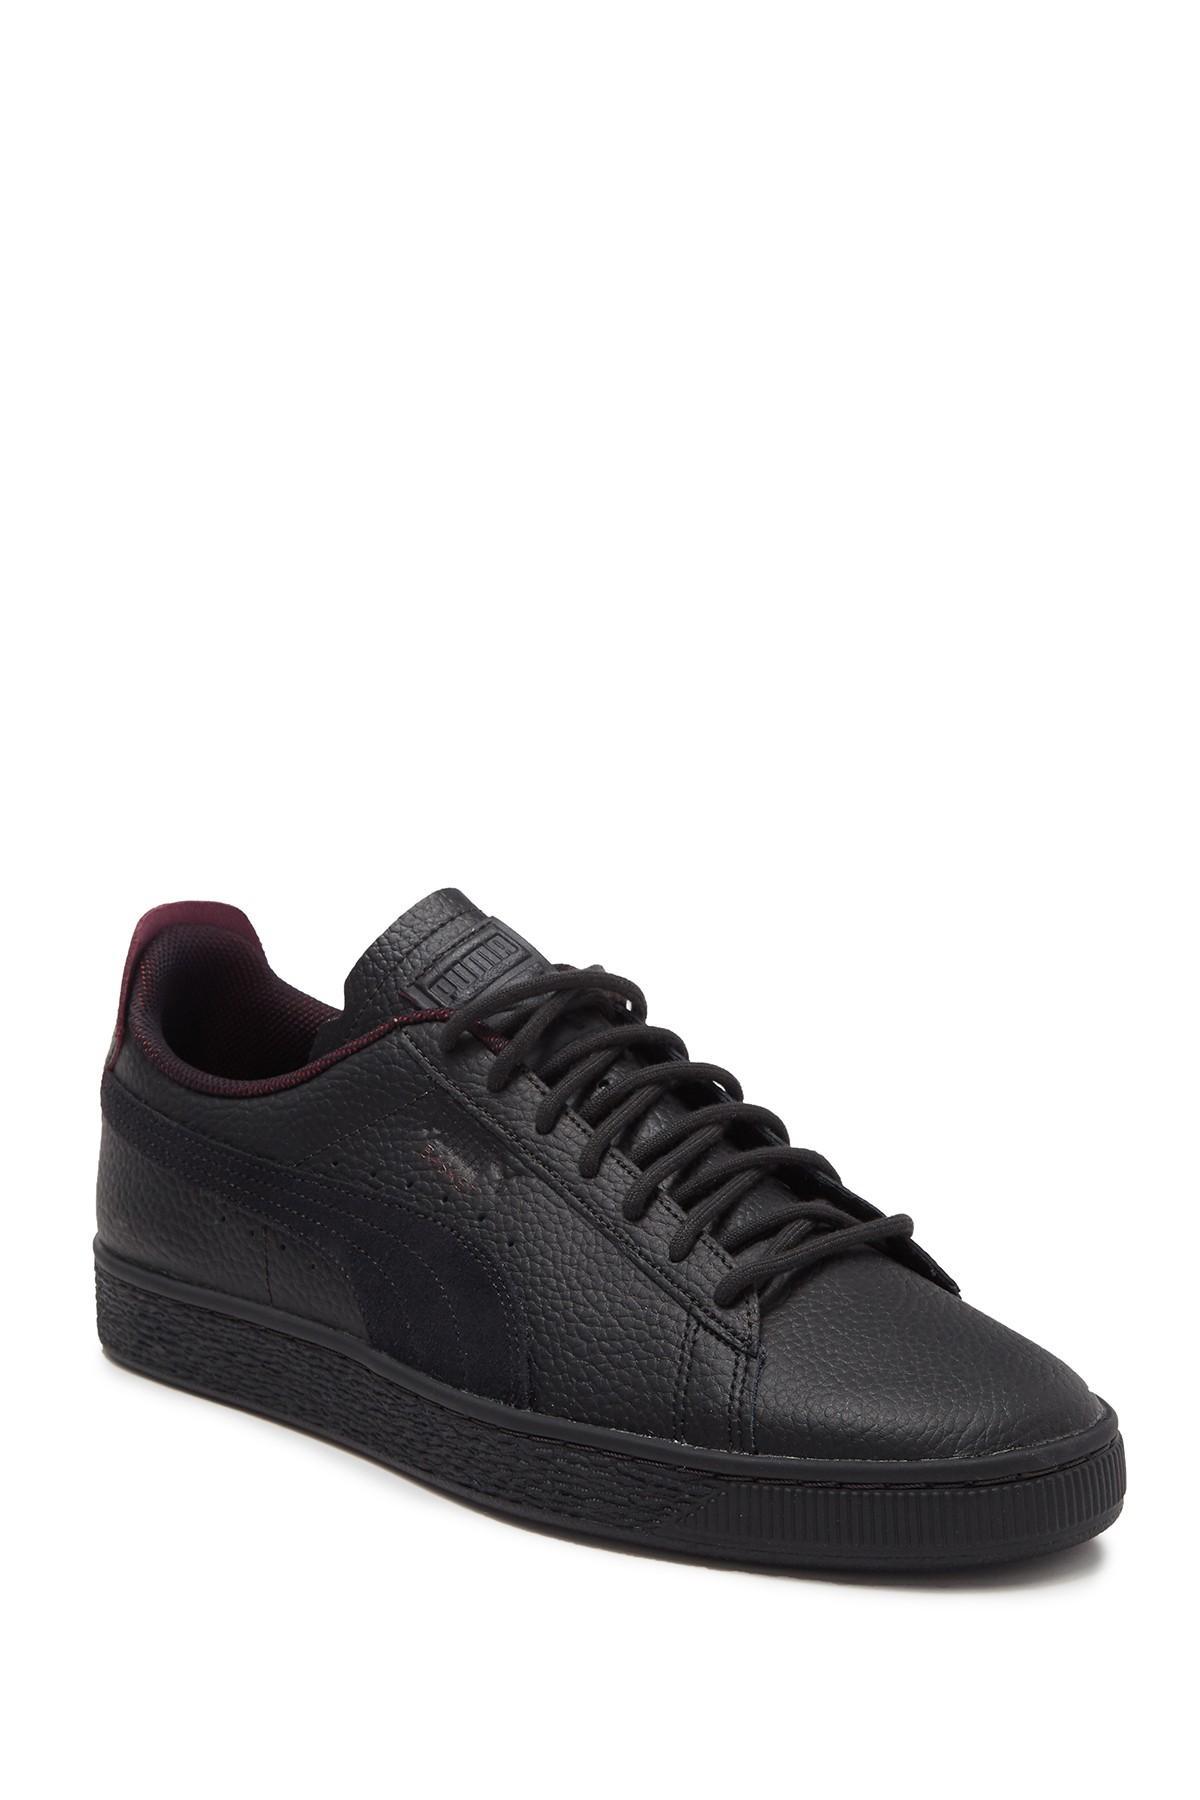 PUMA Scuderia Ferrari Basket Leather Sneaker in Black for Men - Lyst